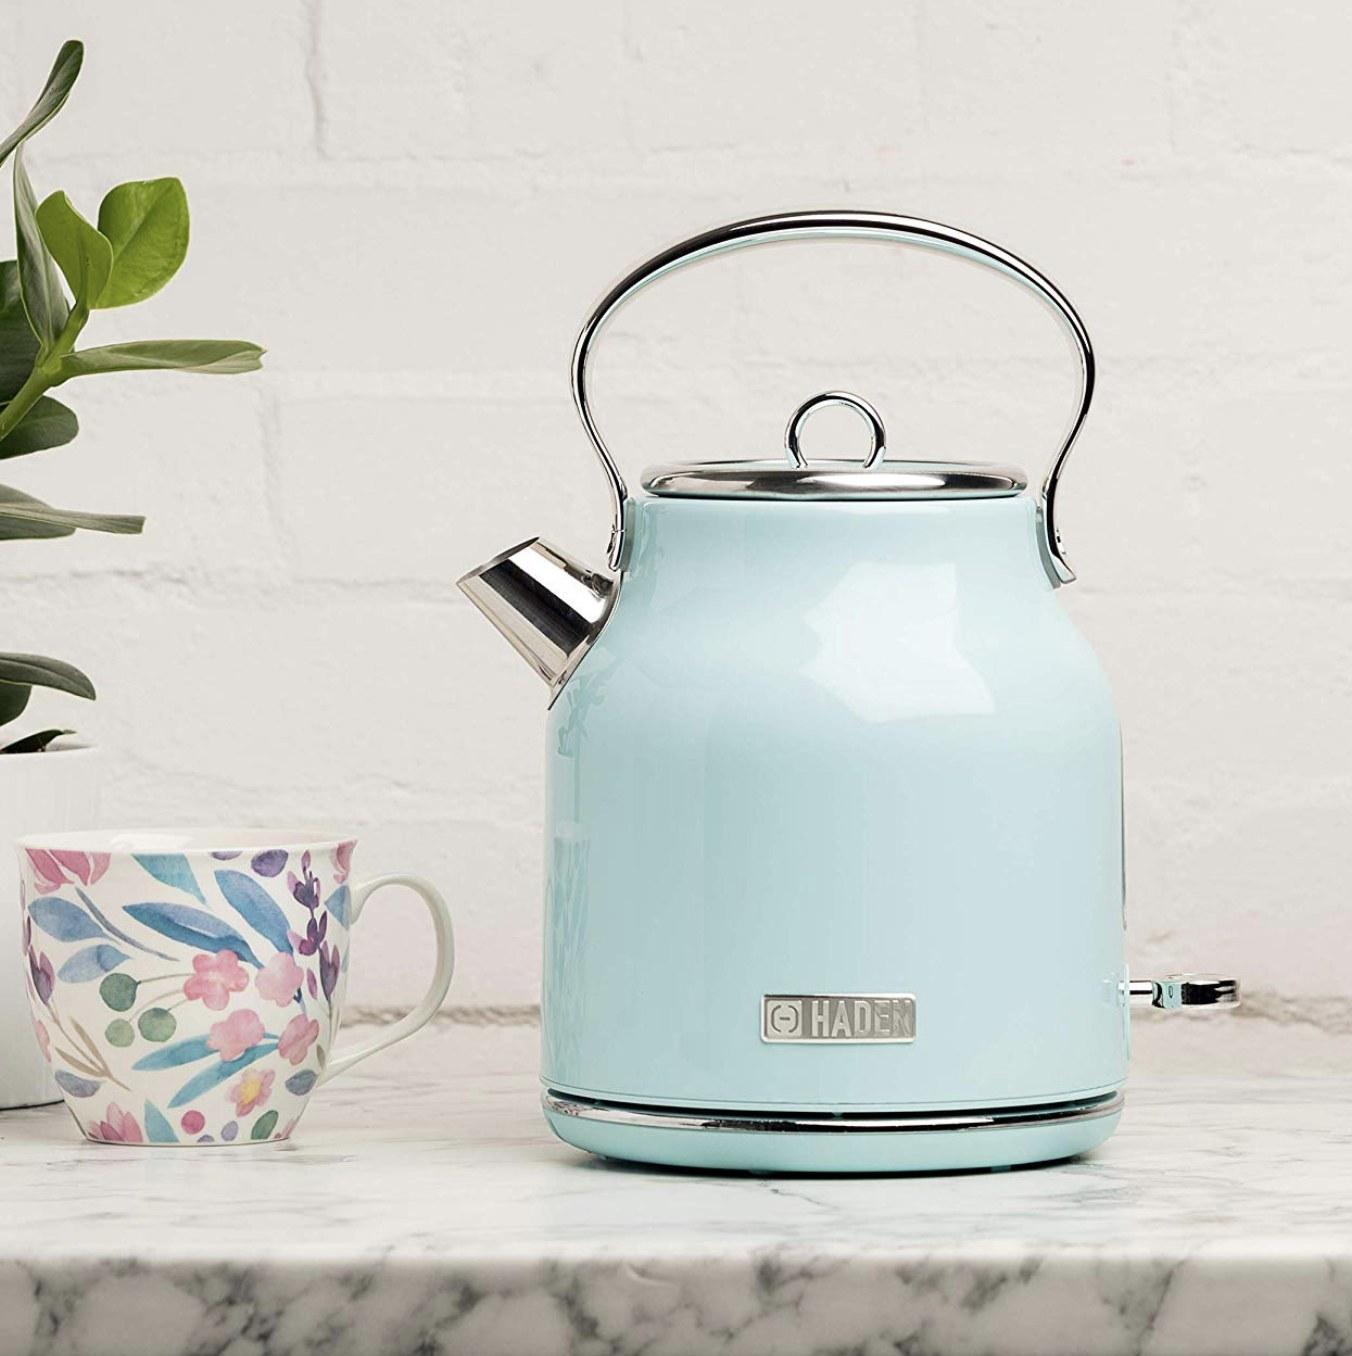 A light blue electric tea kettle